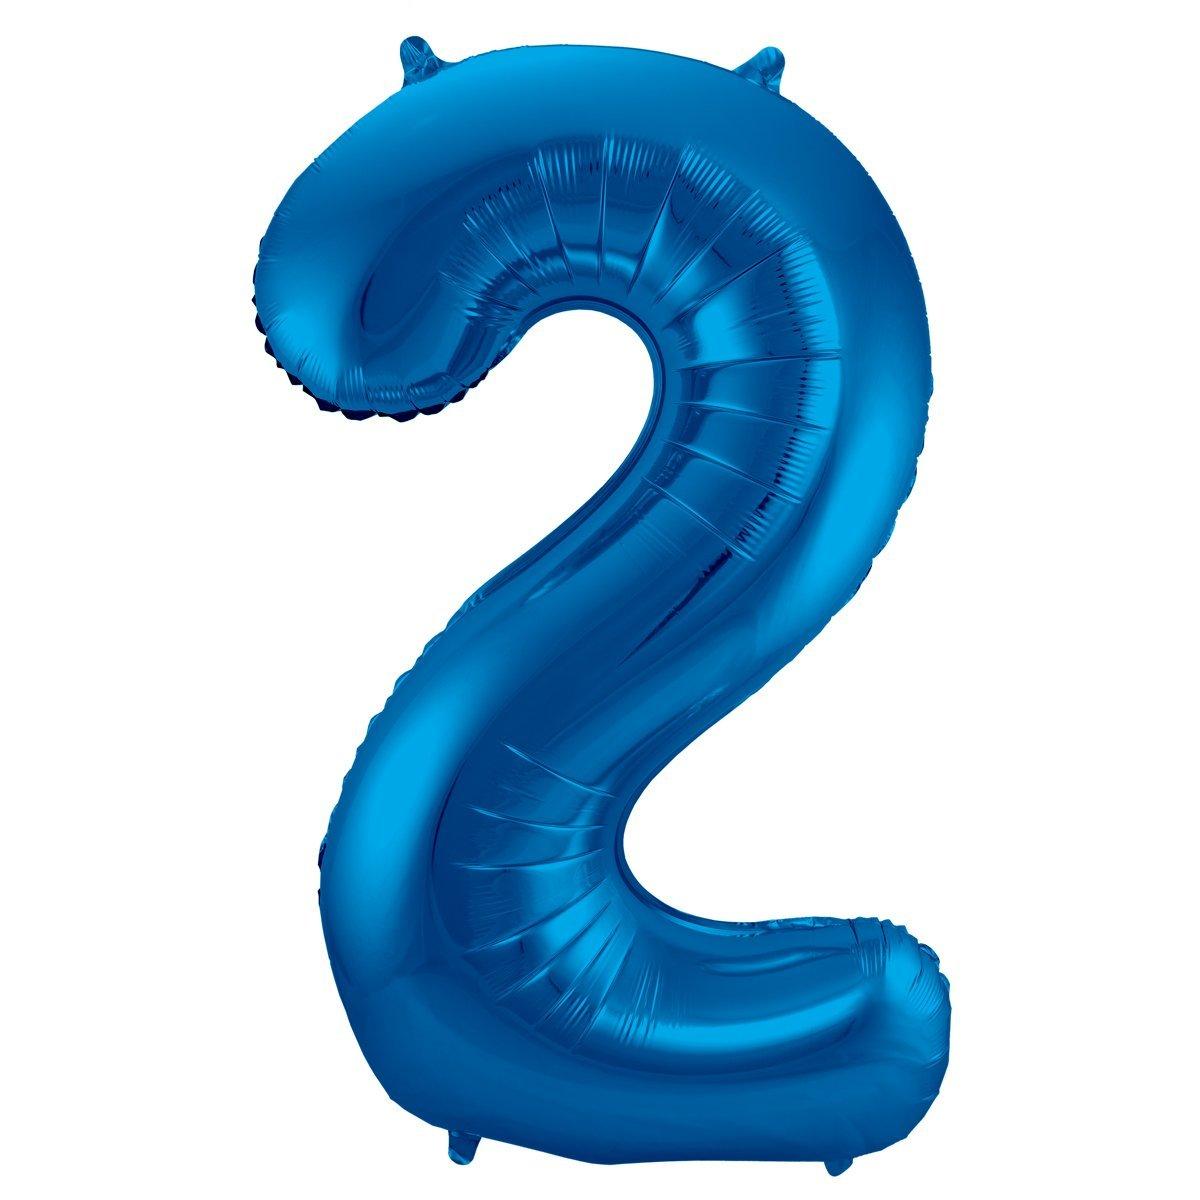 Folienballon Zahl 2 - in Blau